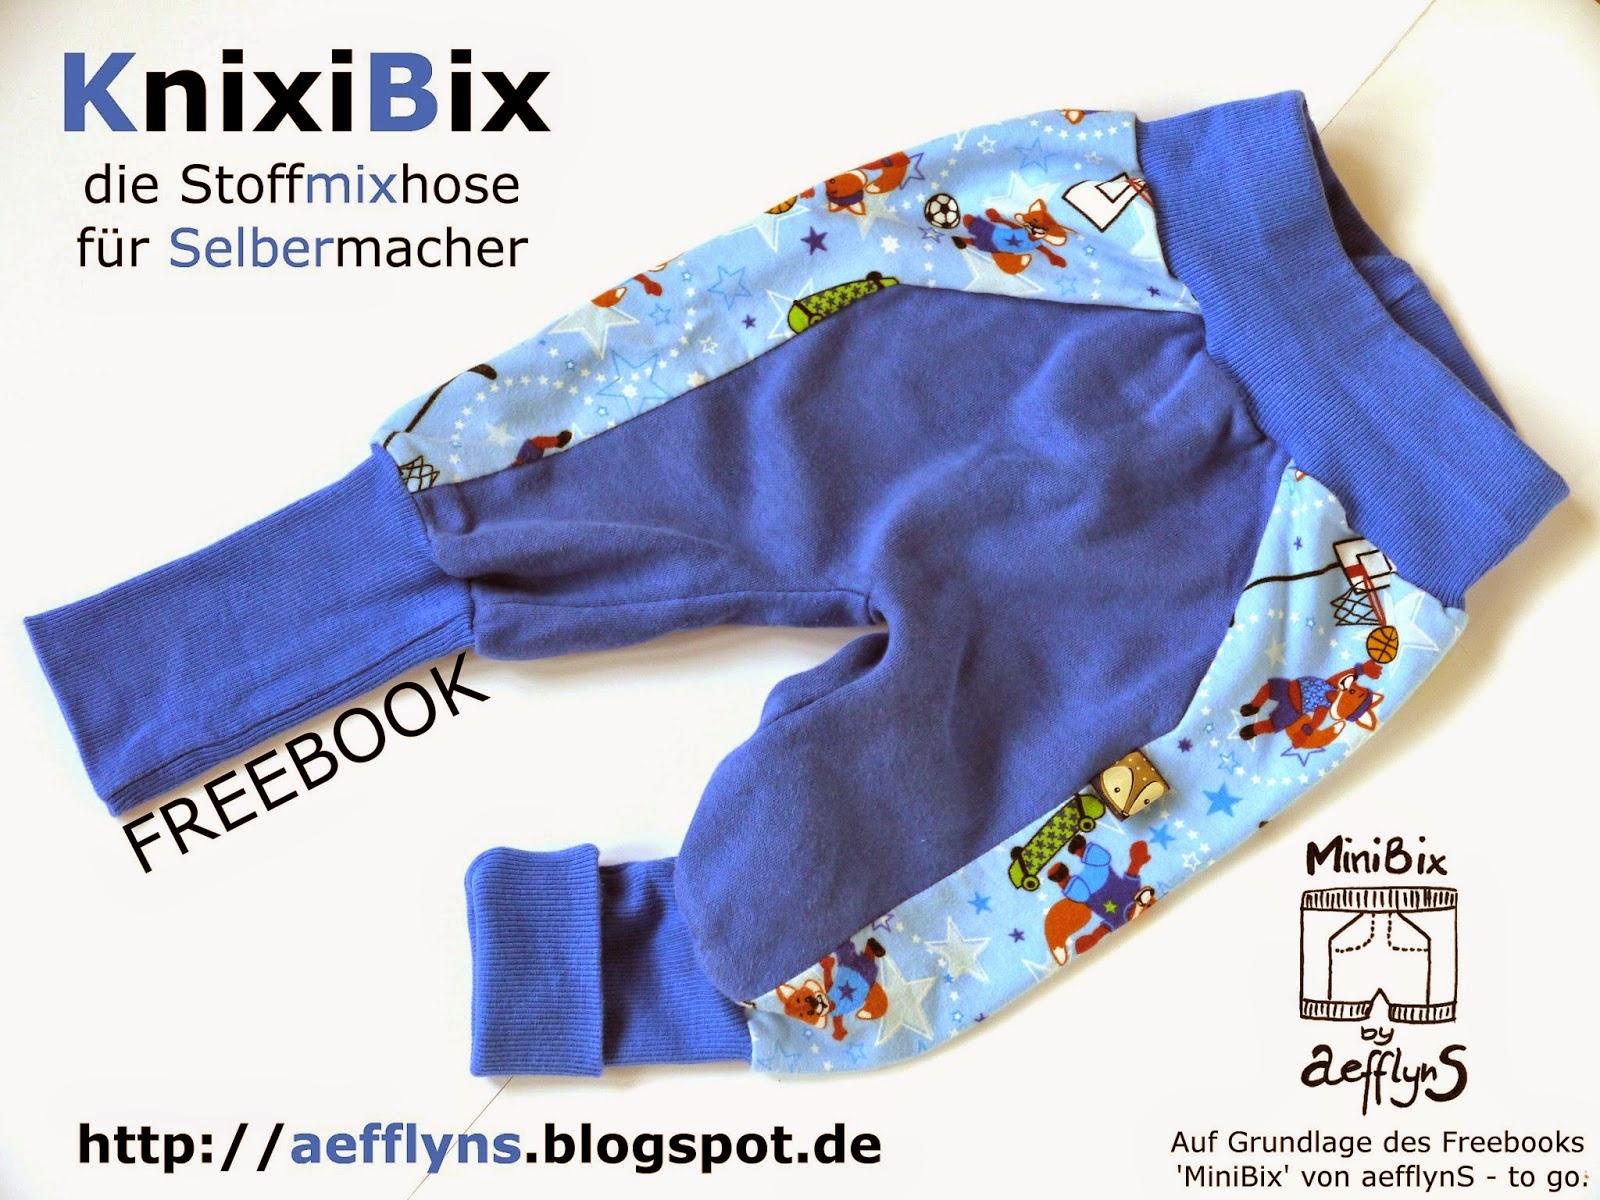 http://aefflyns.blogspot.de/2014/10/knixibix-die-freebook-erweiterung-zur.html